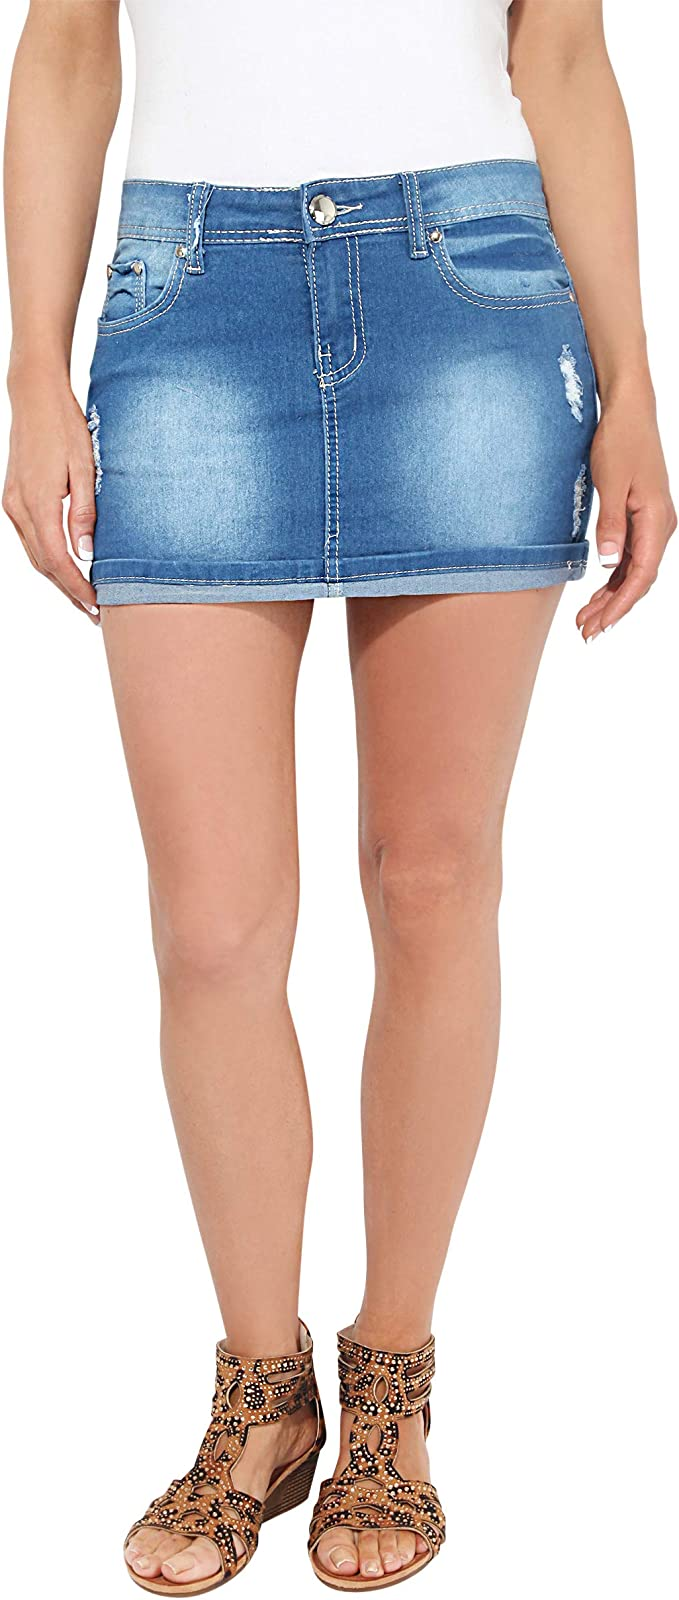 KRISP 3442-BLU-12, Falda Mujer Micro Minifalda Vaquera Desgastada ...